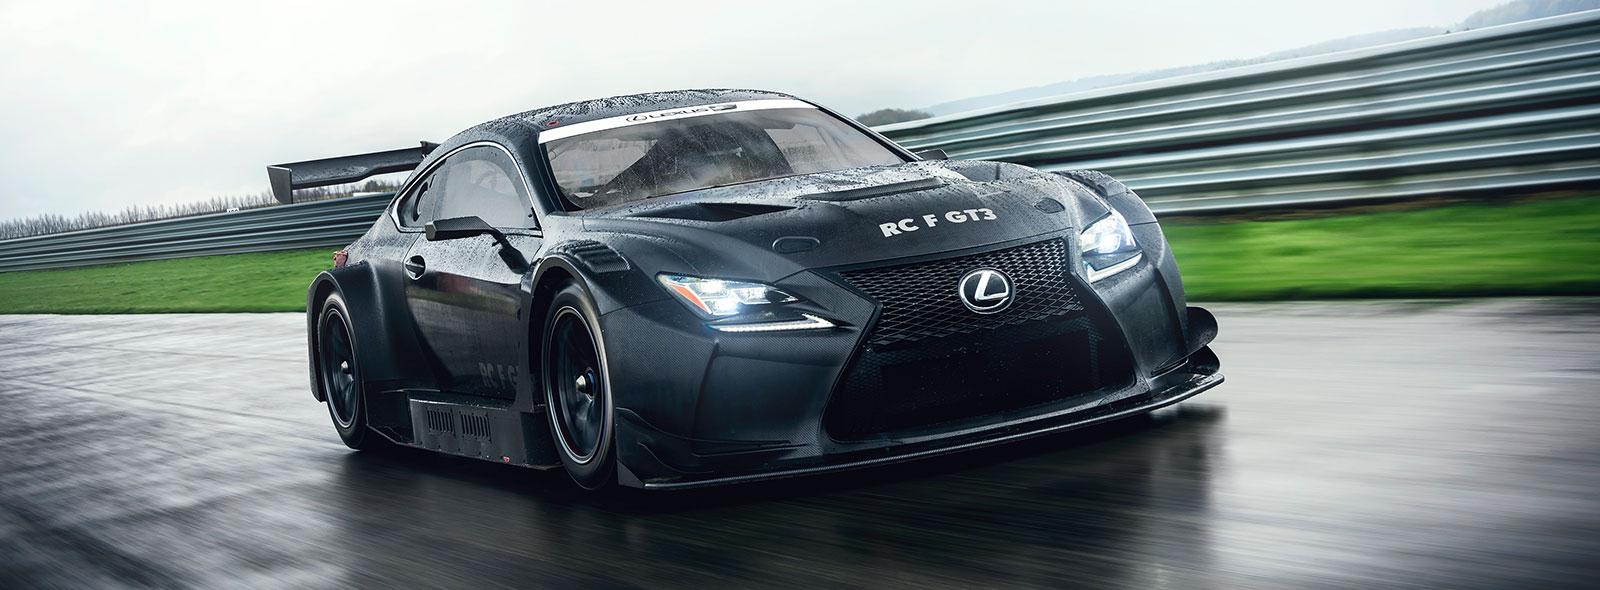 2017 Lexus RC F GT3 Gallery 01